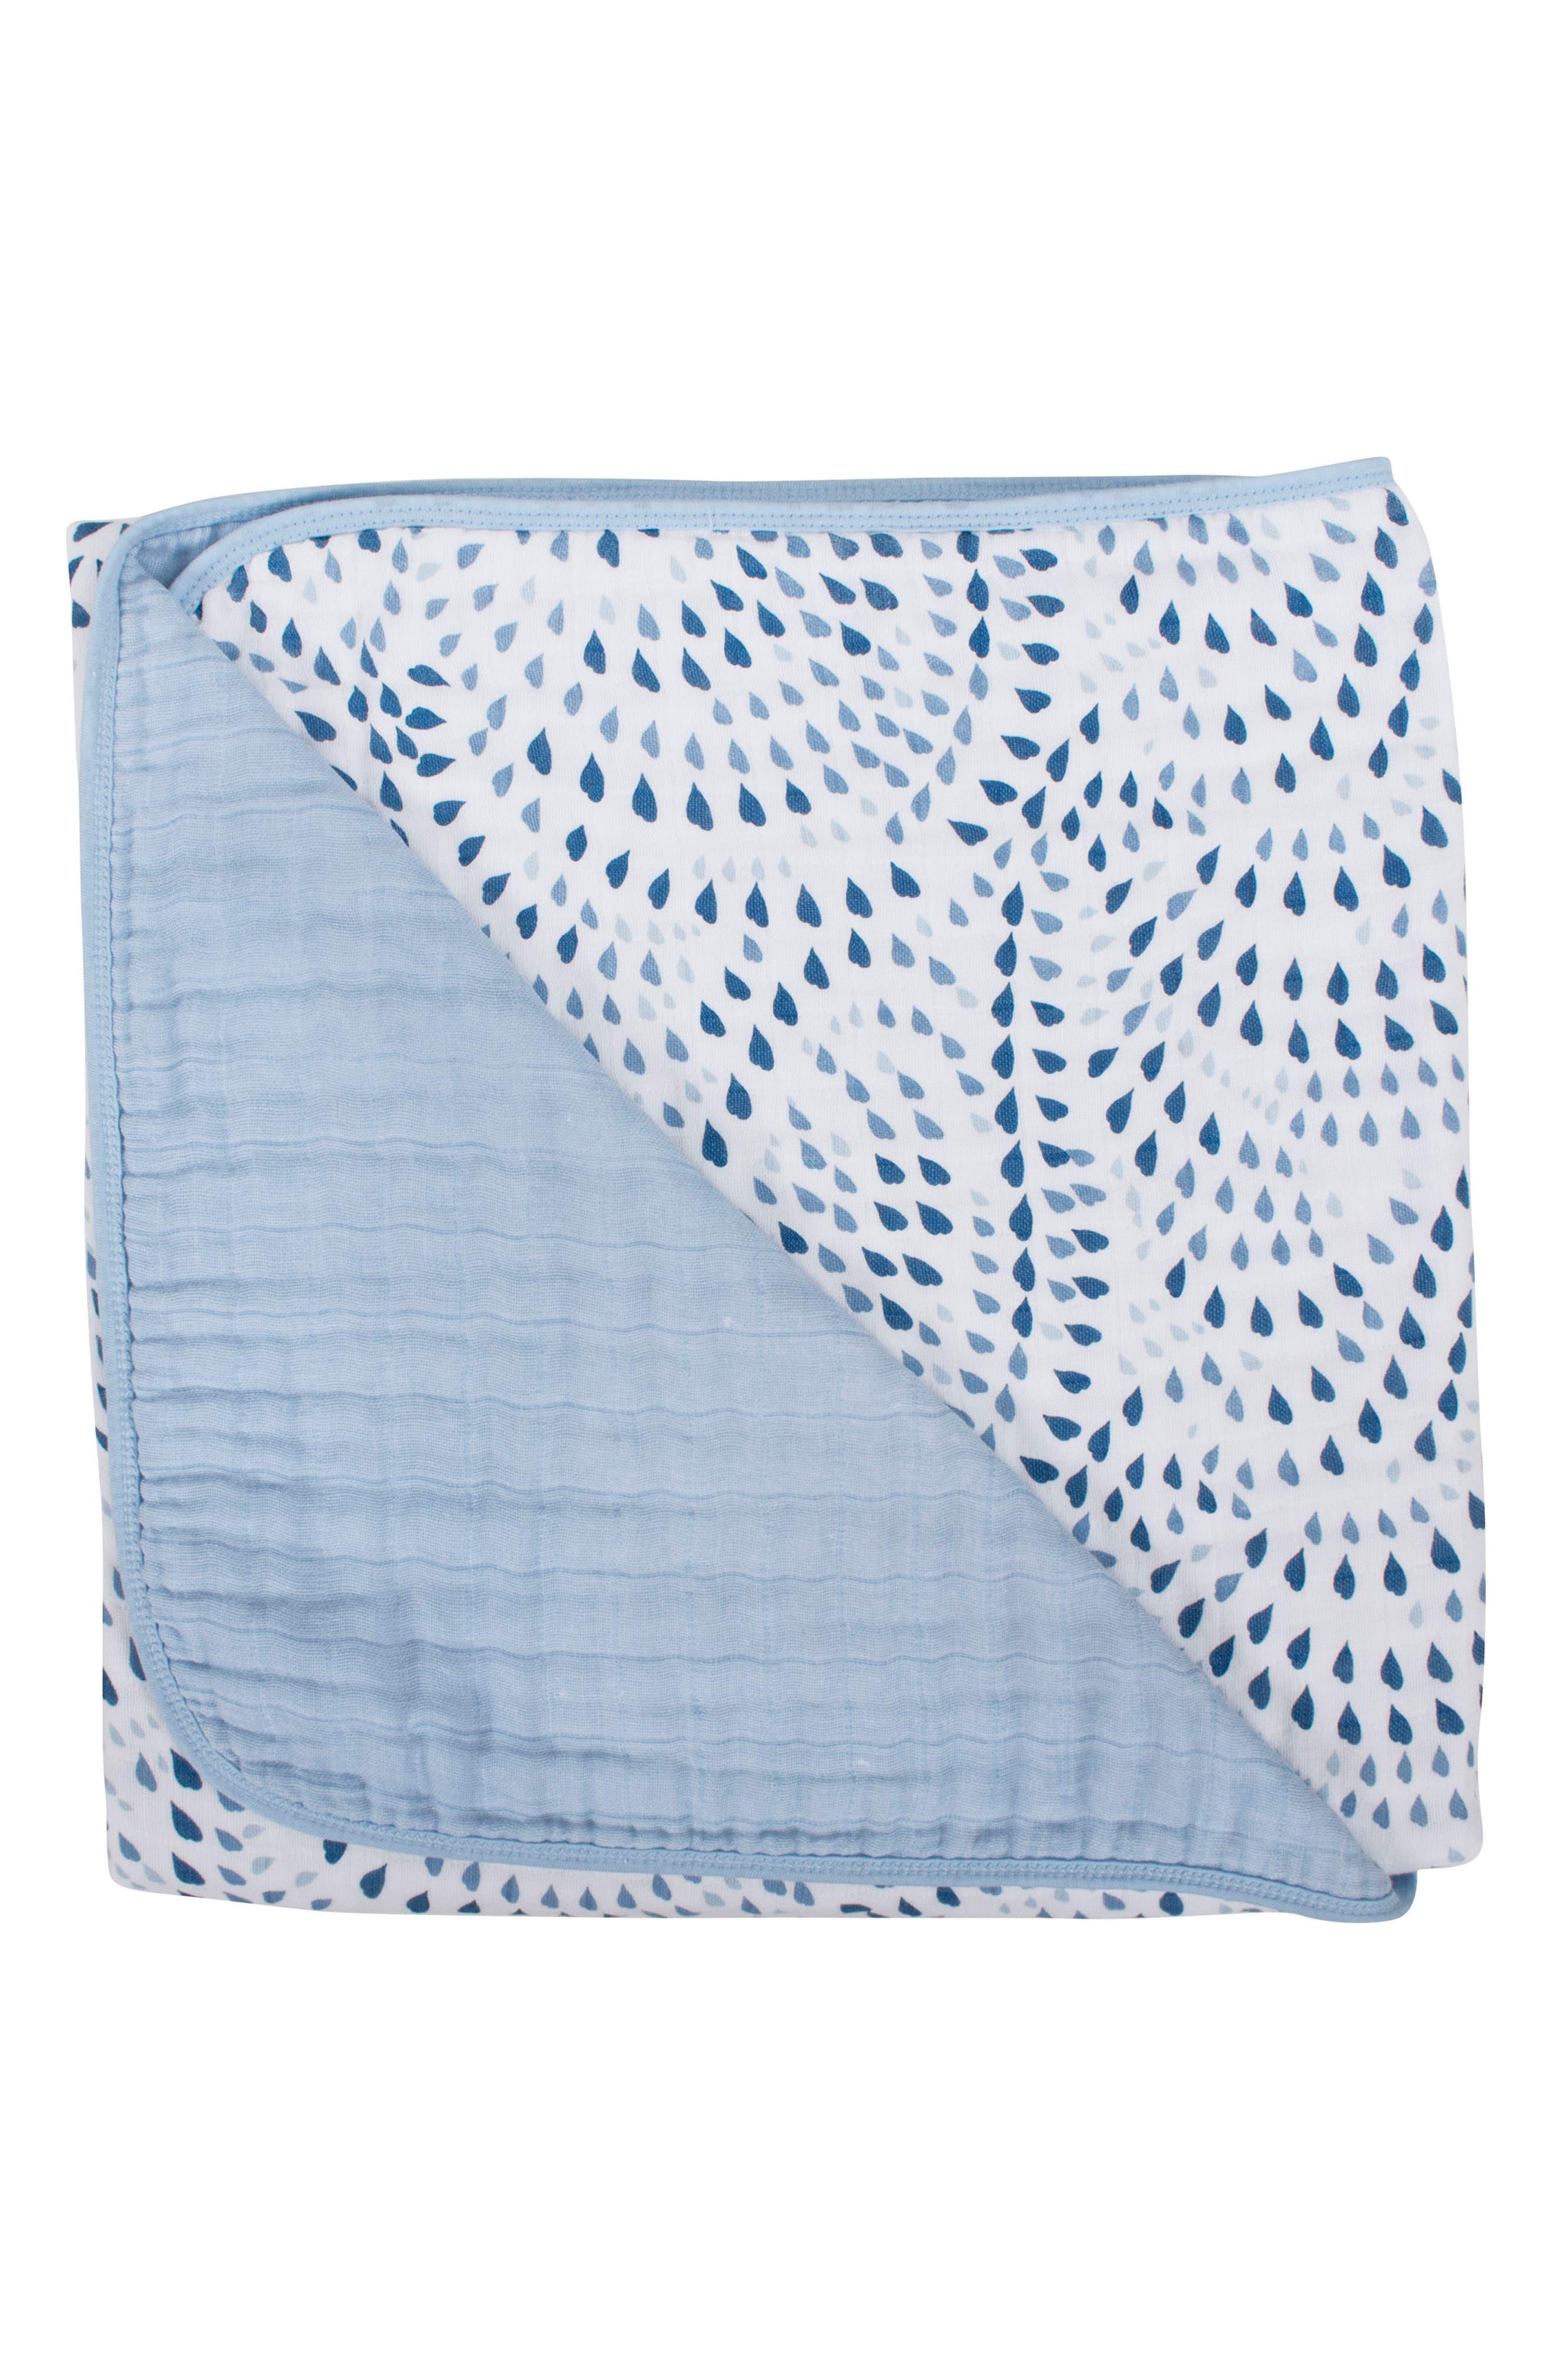 Cotton Muslin Blanket,                             Main thumbnail 1, color,                             Serenity And Sky